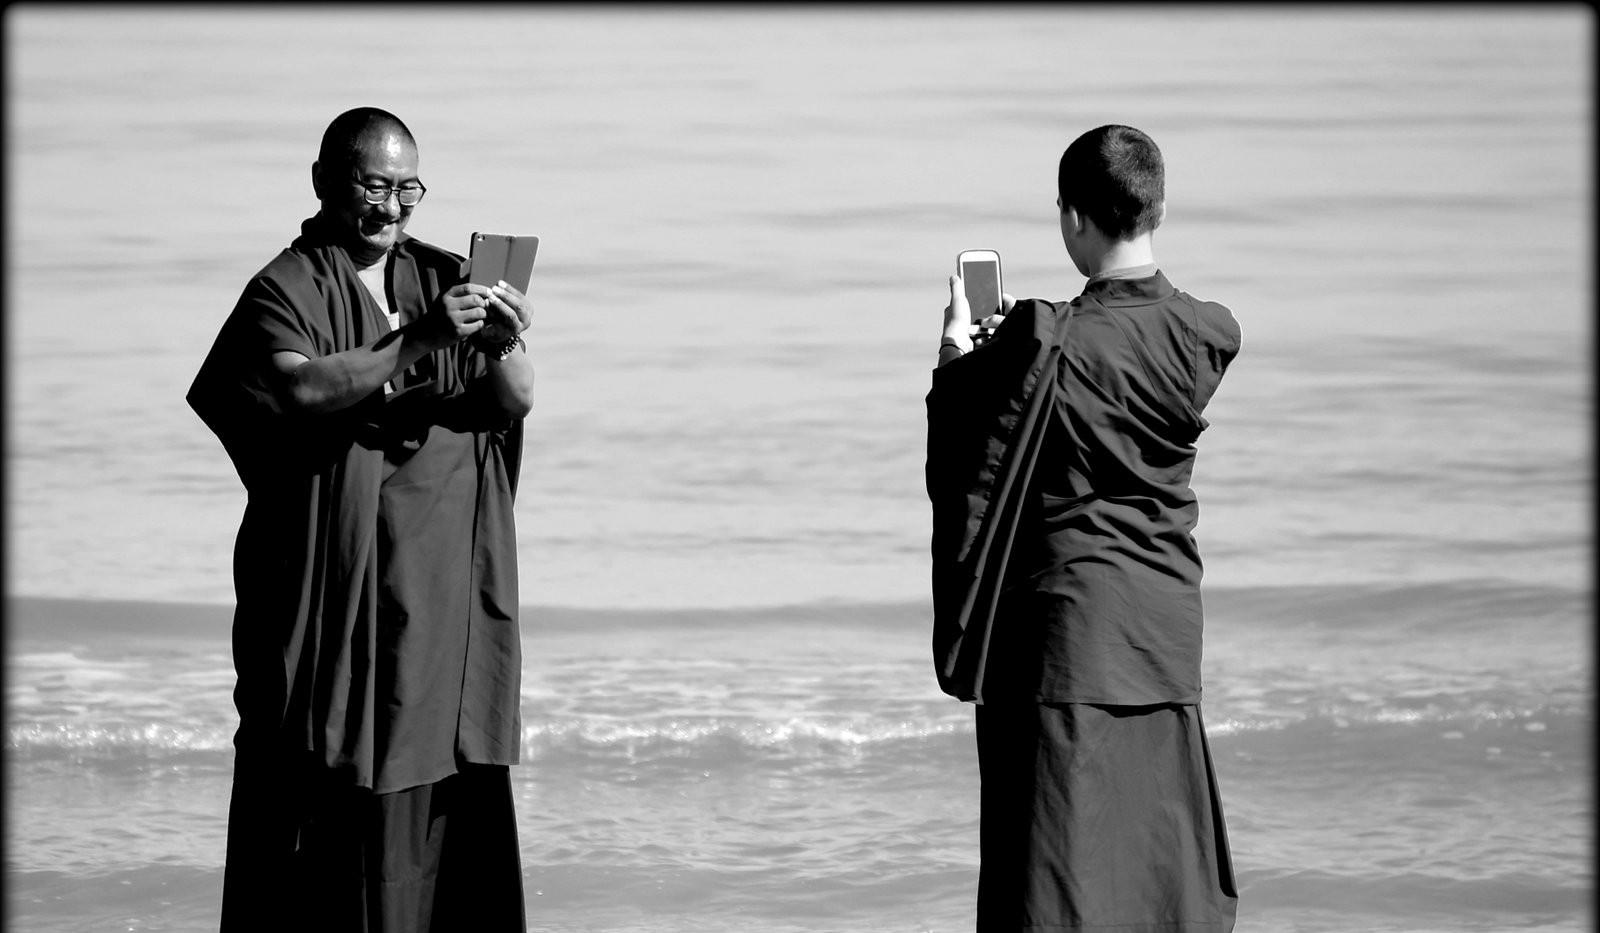 Rinpoche_en_Lobsang_Nyima_aan_zee.jpg